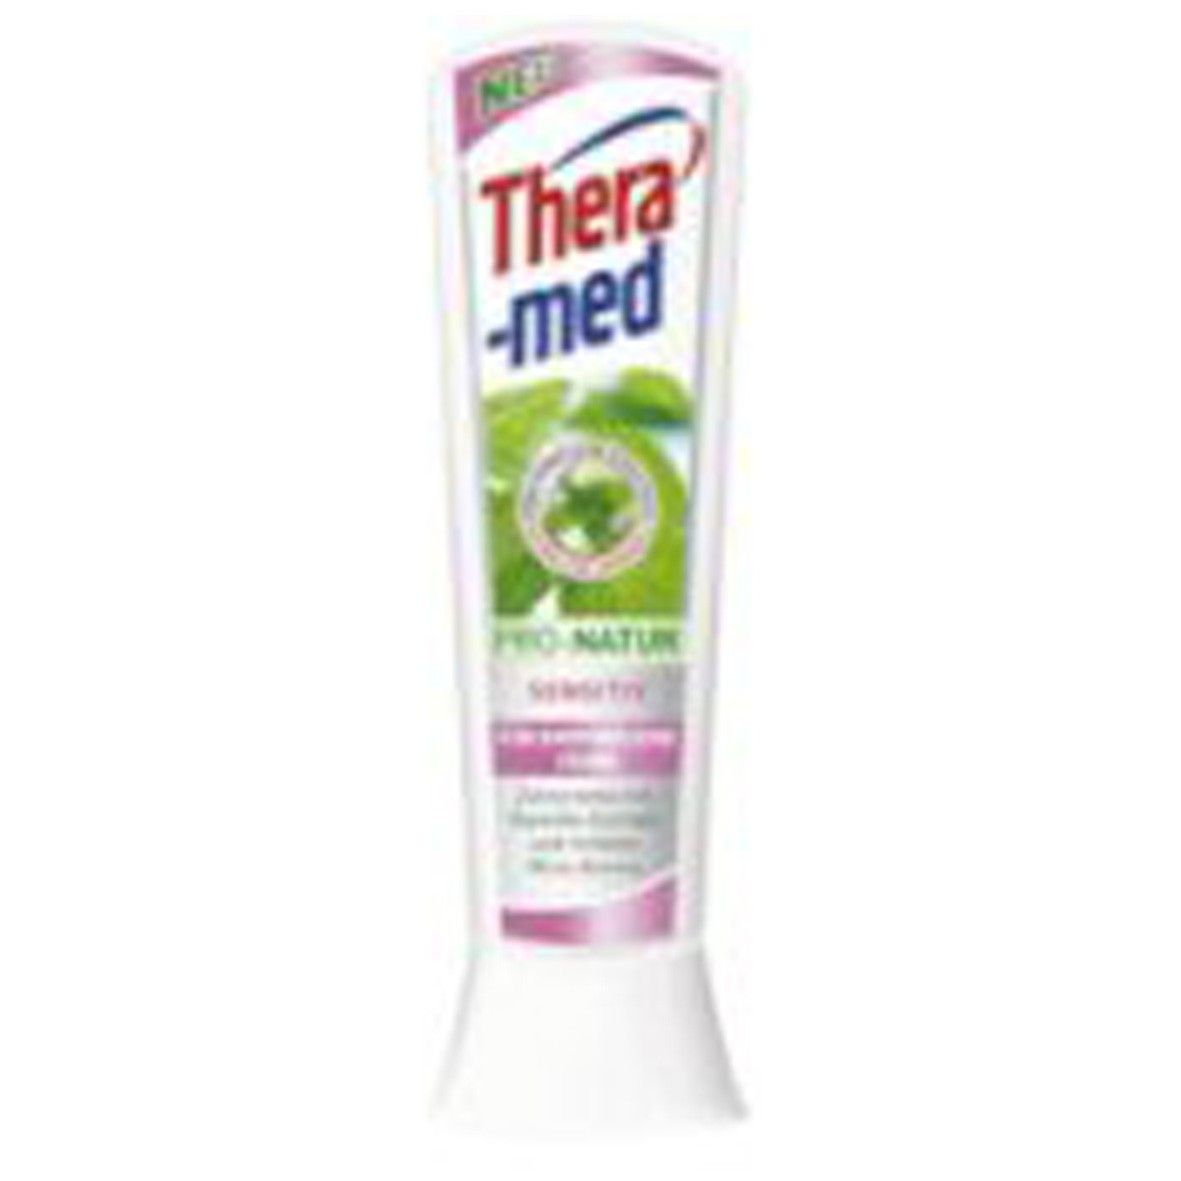 Theramed tandpasta staande tube 75ml Sensitive 5410091639471